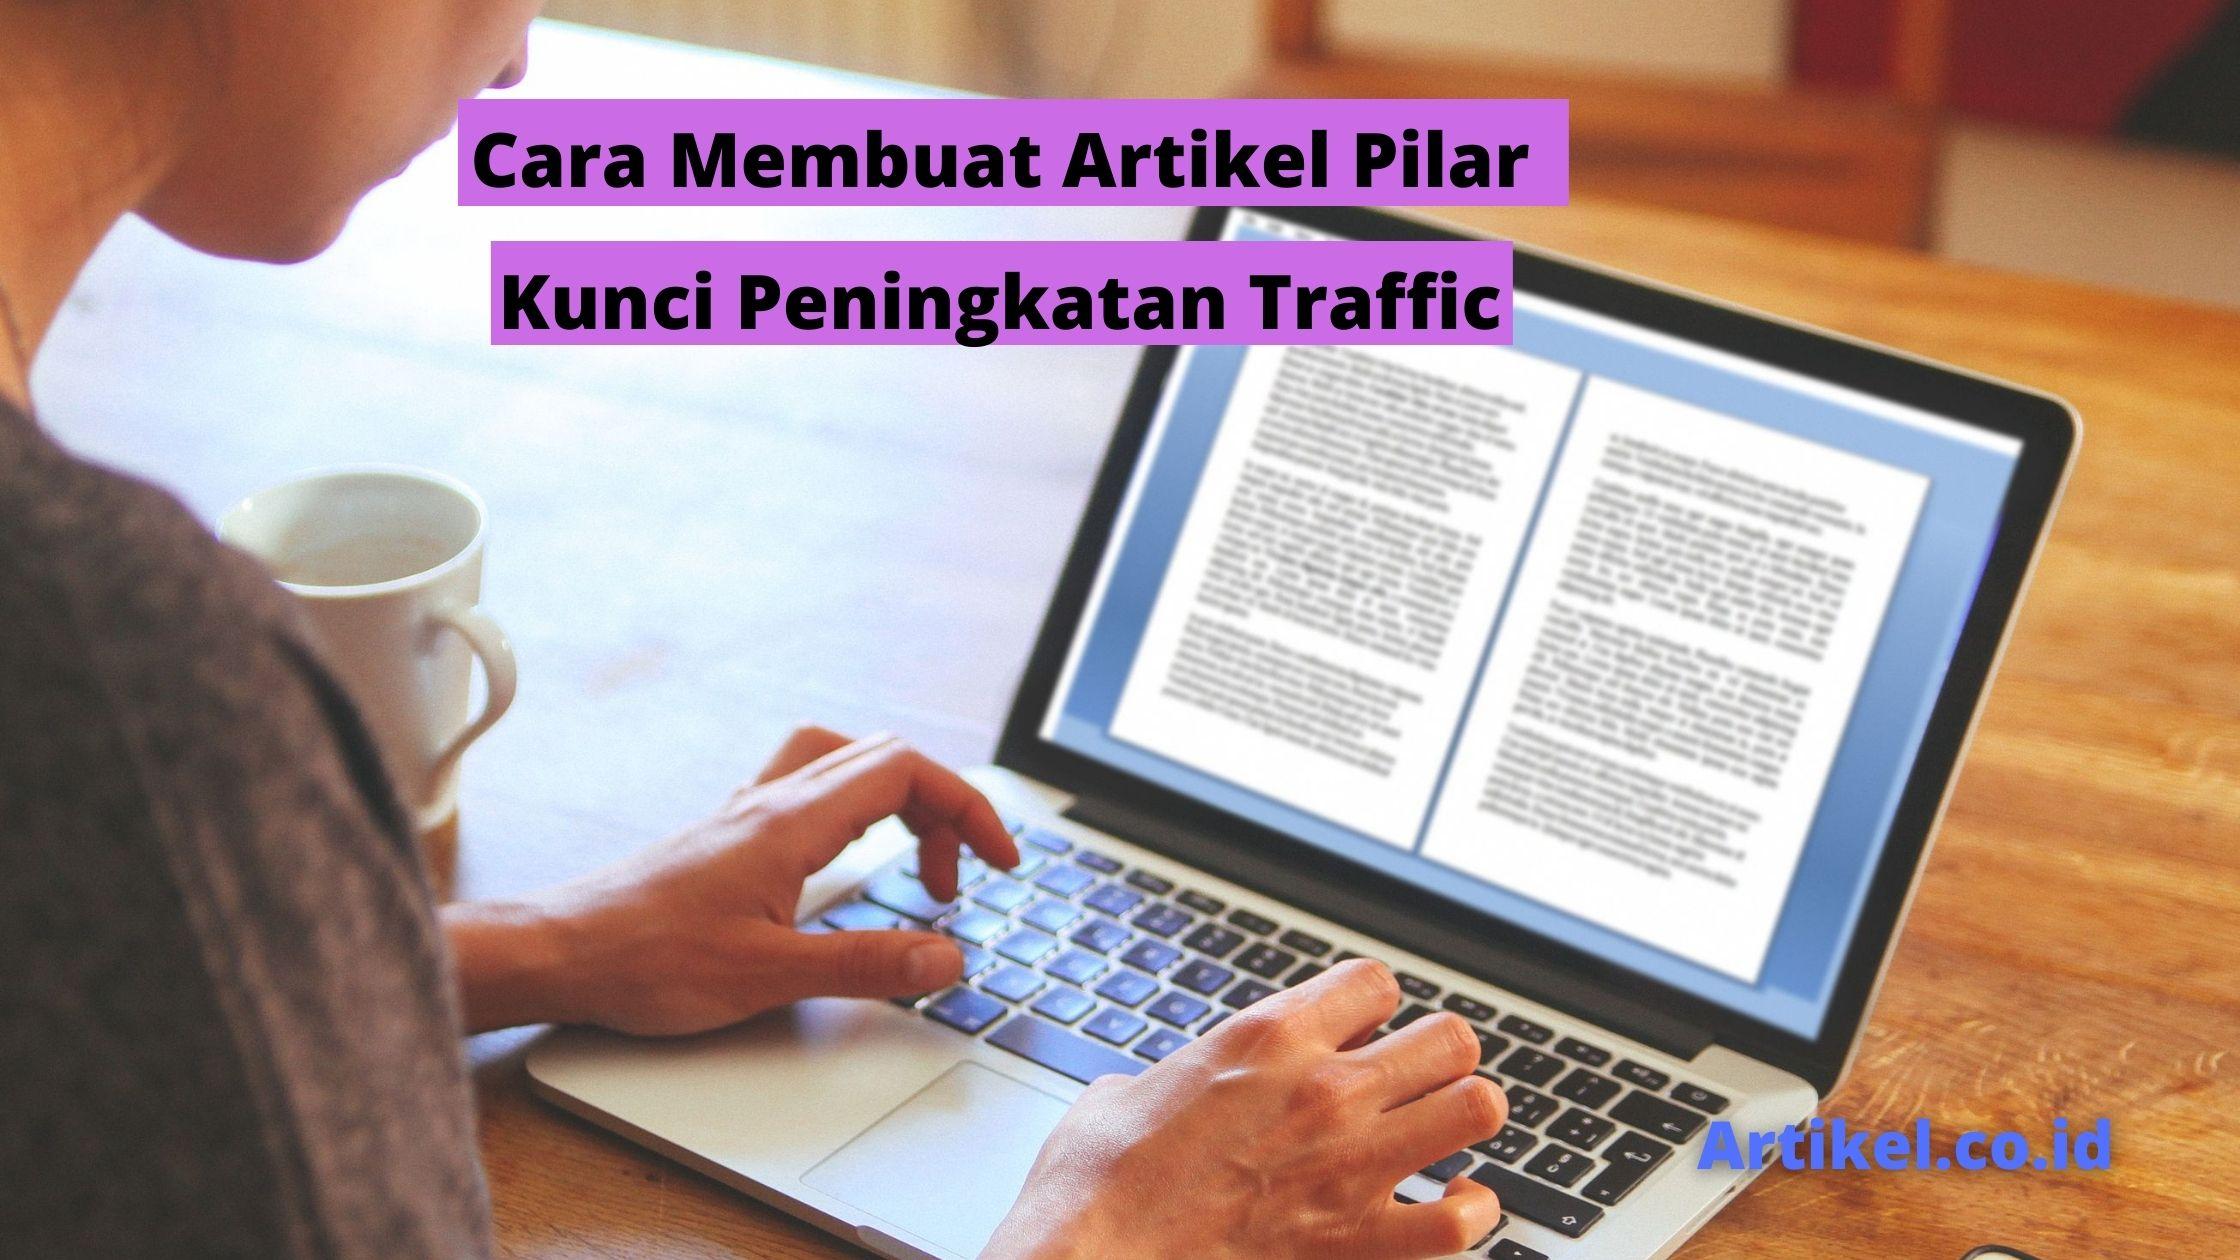 Read more about the article Cara Membuat Artikel Pilar Kunci Peningkatan Traffic